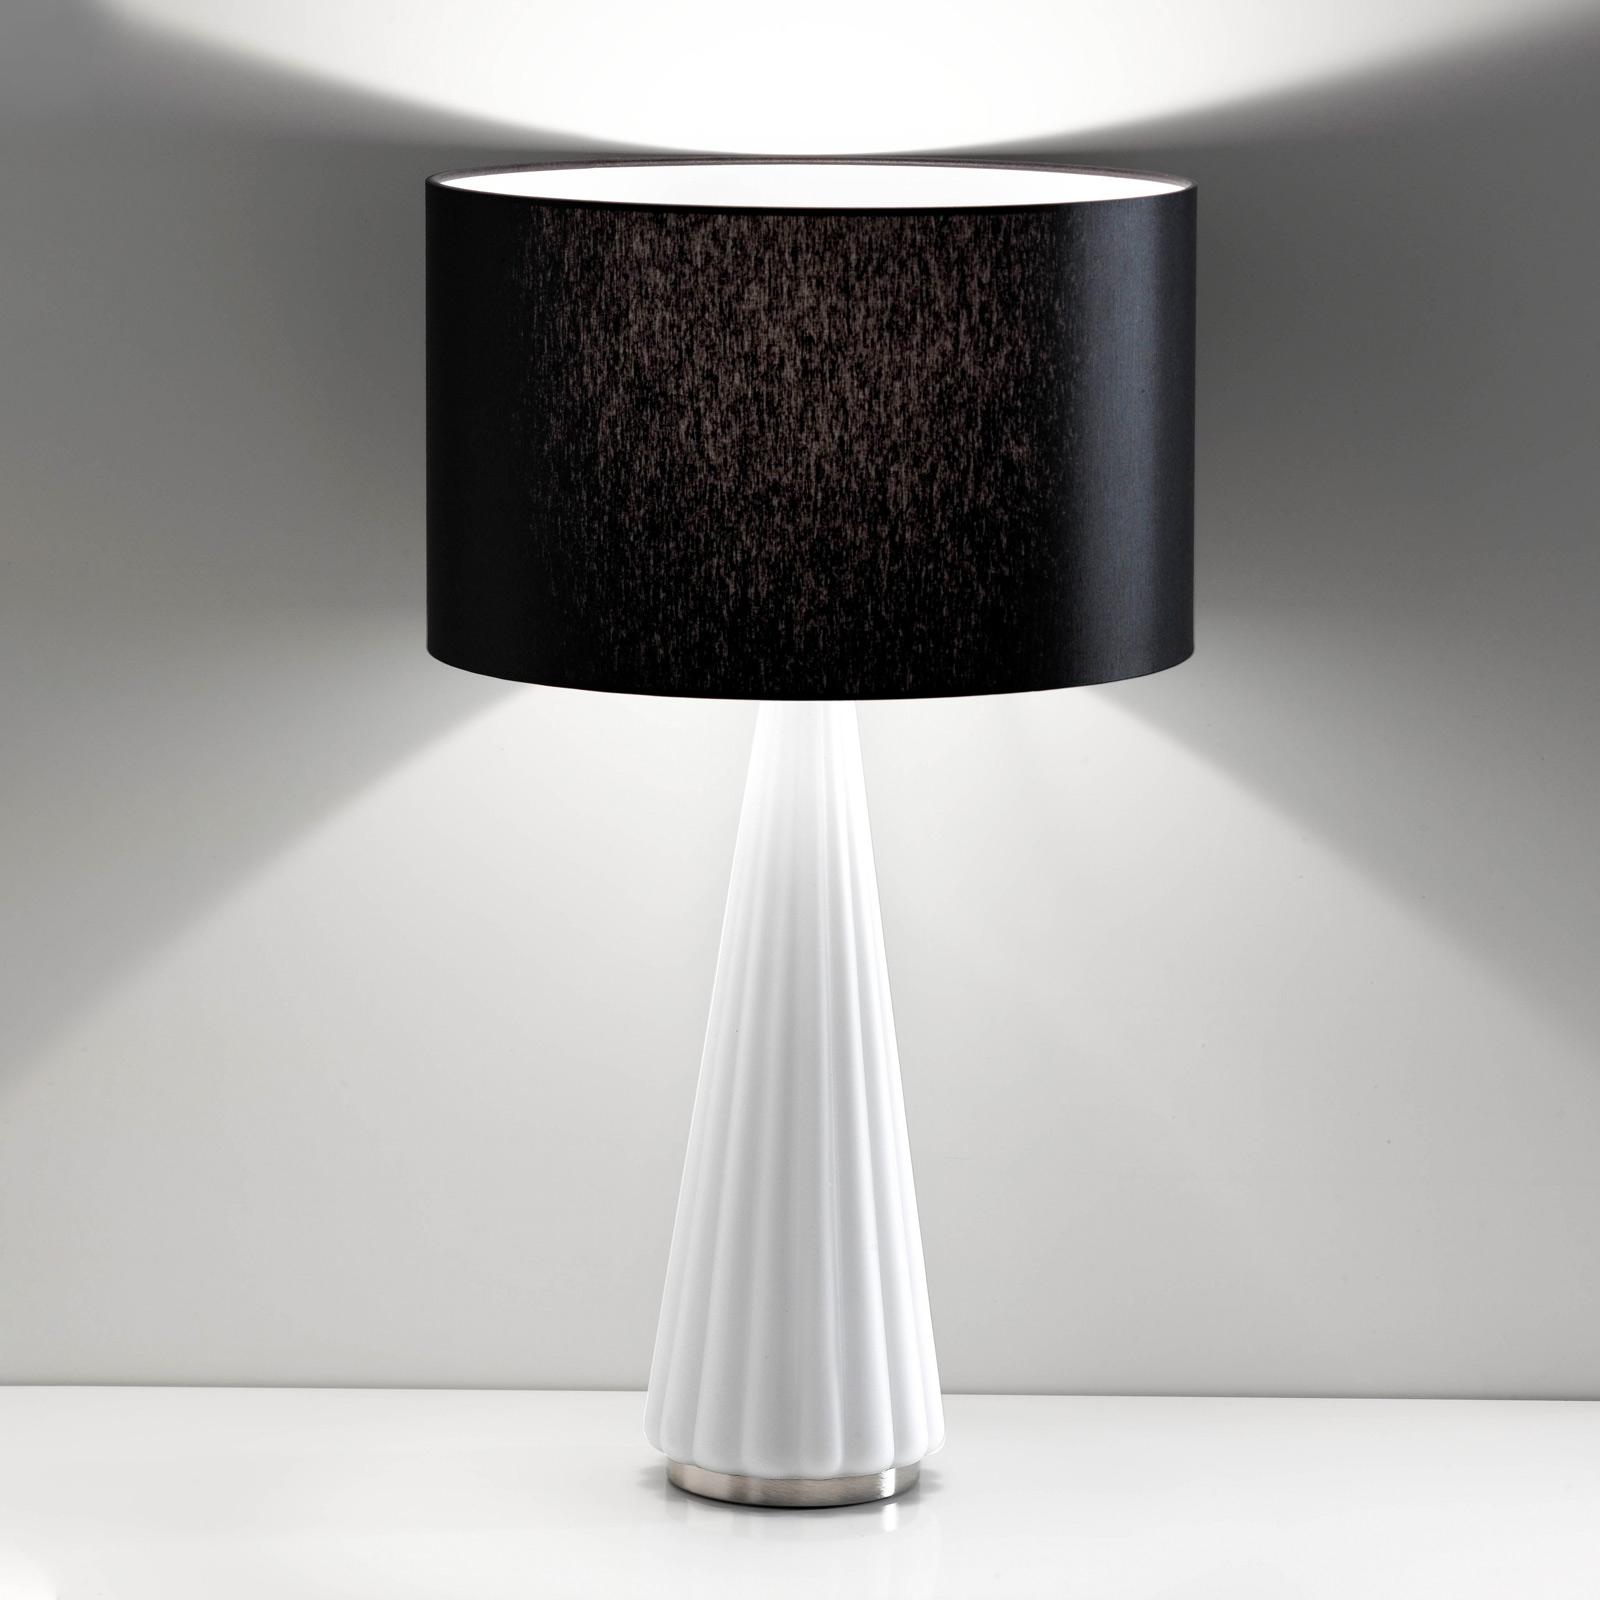 Pöytälamppu Costa Rica musta, valkoinen